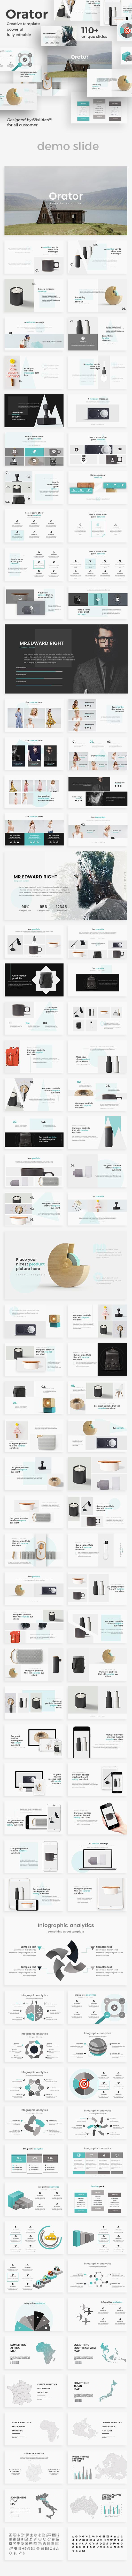 Orator Minimal Powerpoint Template - Creative PowerPoint Templates